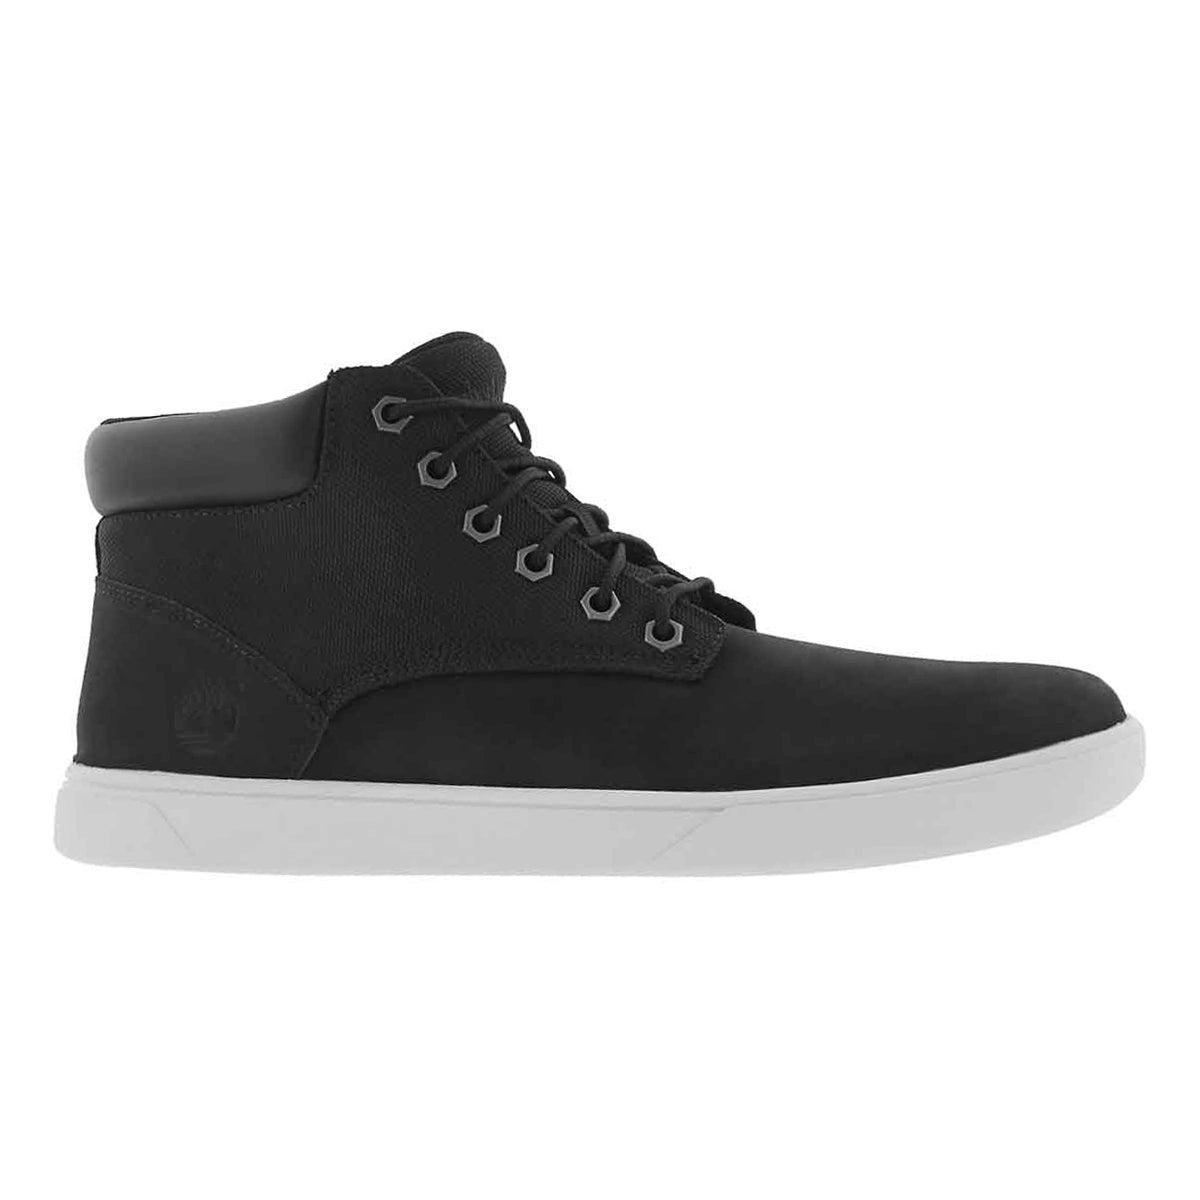 Mns Groveton Plain Toe black chukka boot